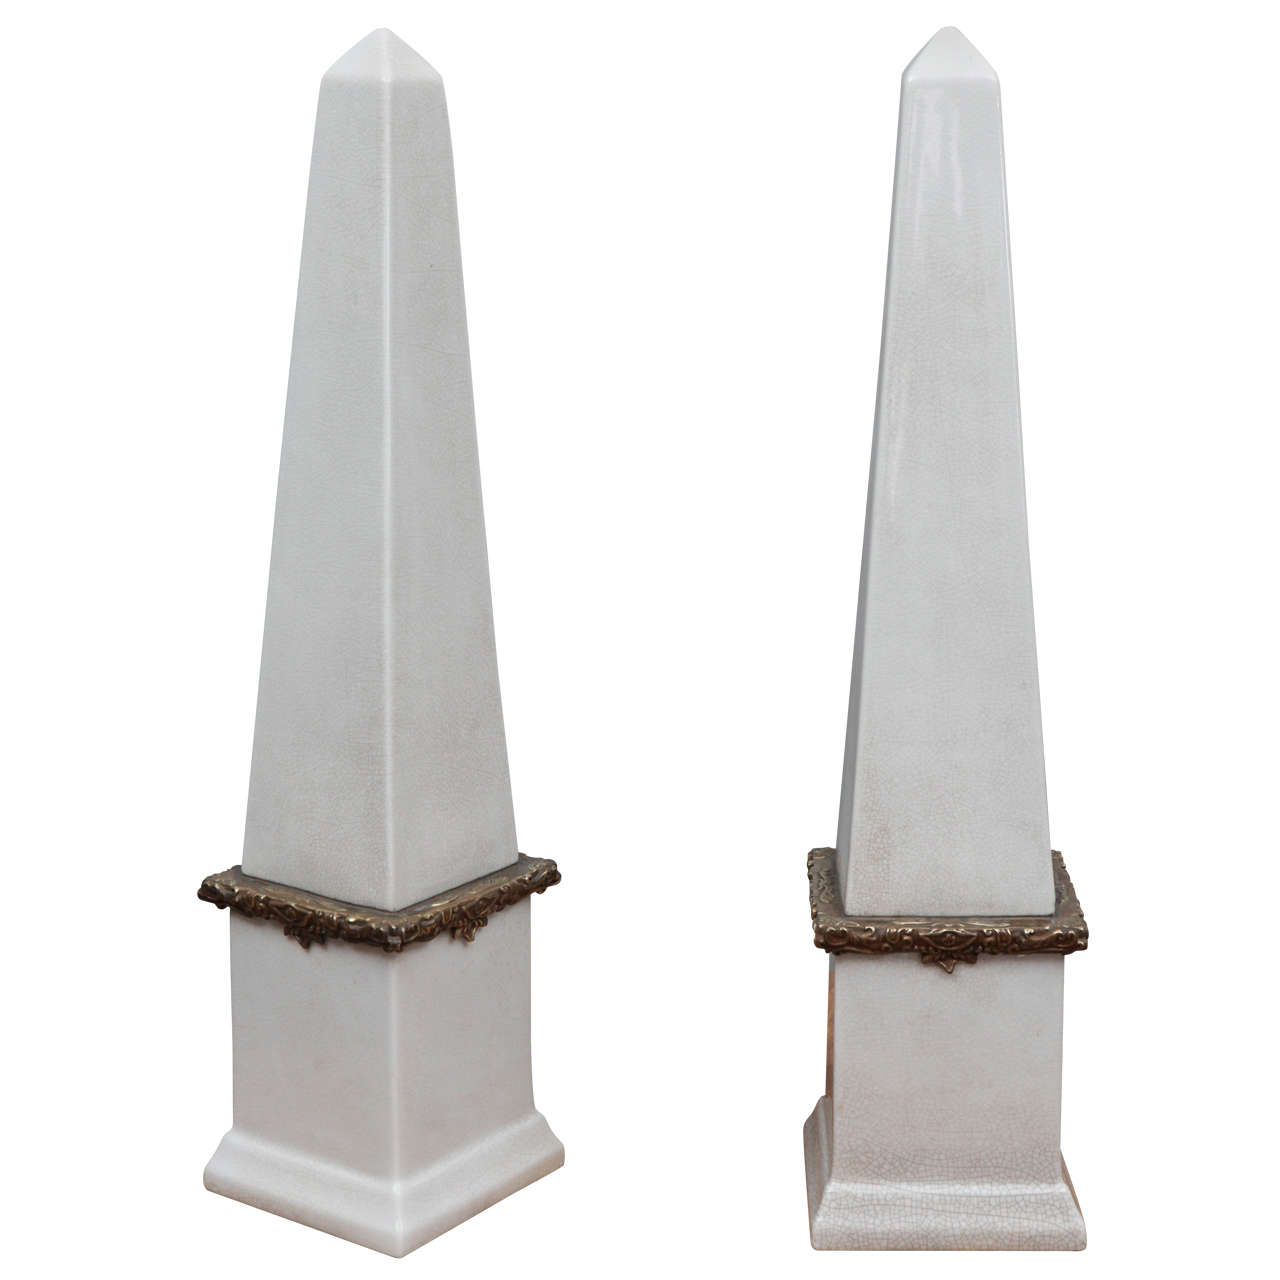 Tall Ceramic Obelisk Statues